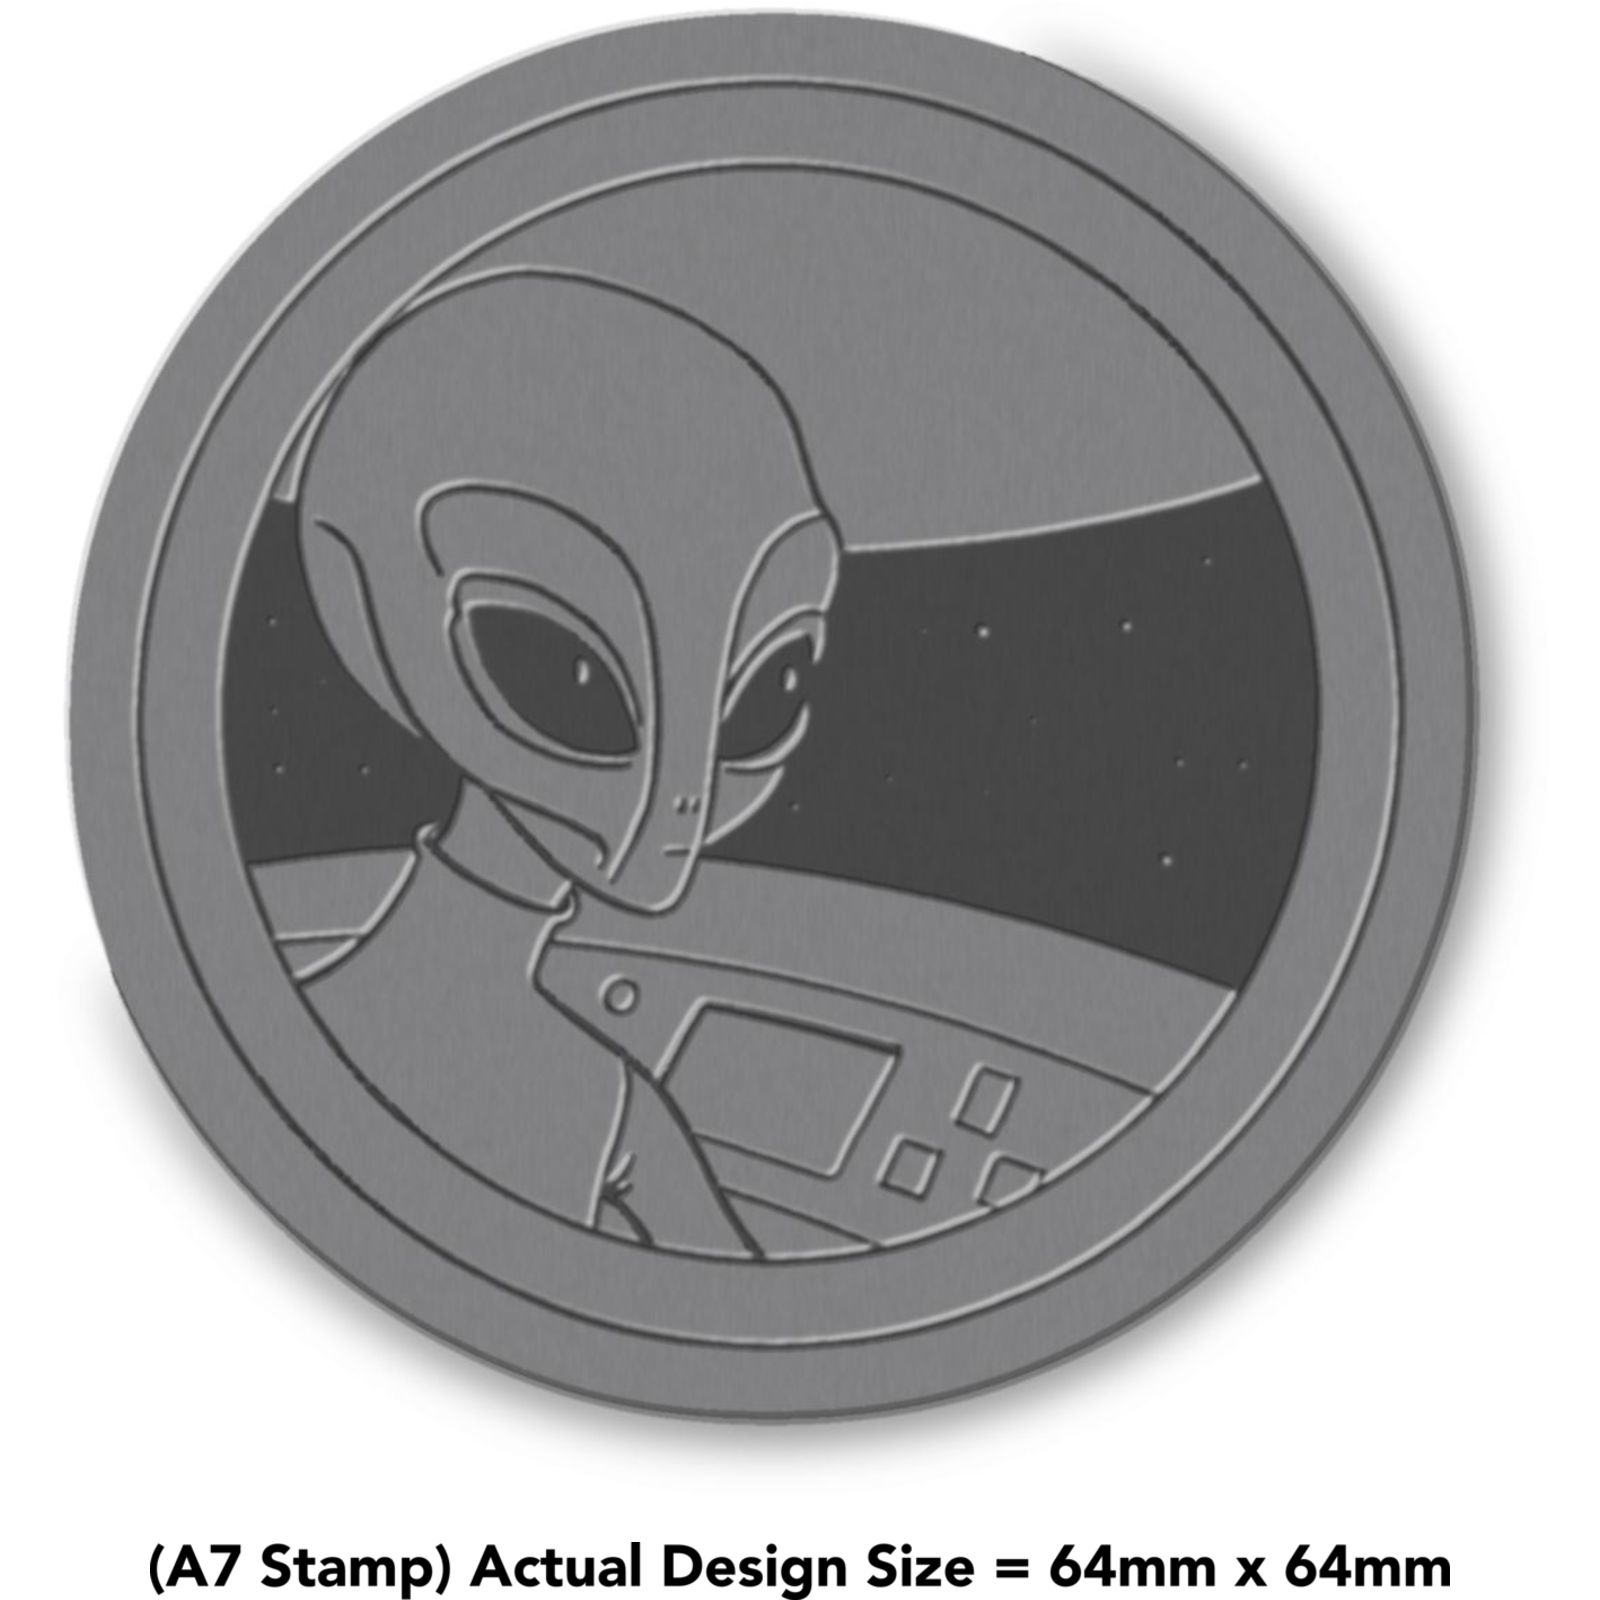 039-Extraterrestre-039-RS007860 miniatura 4